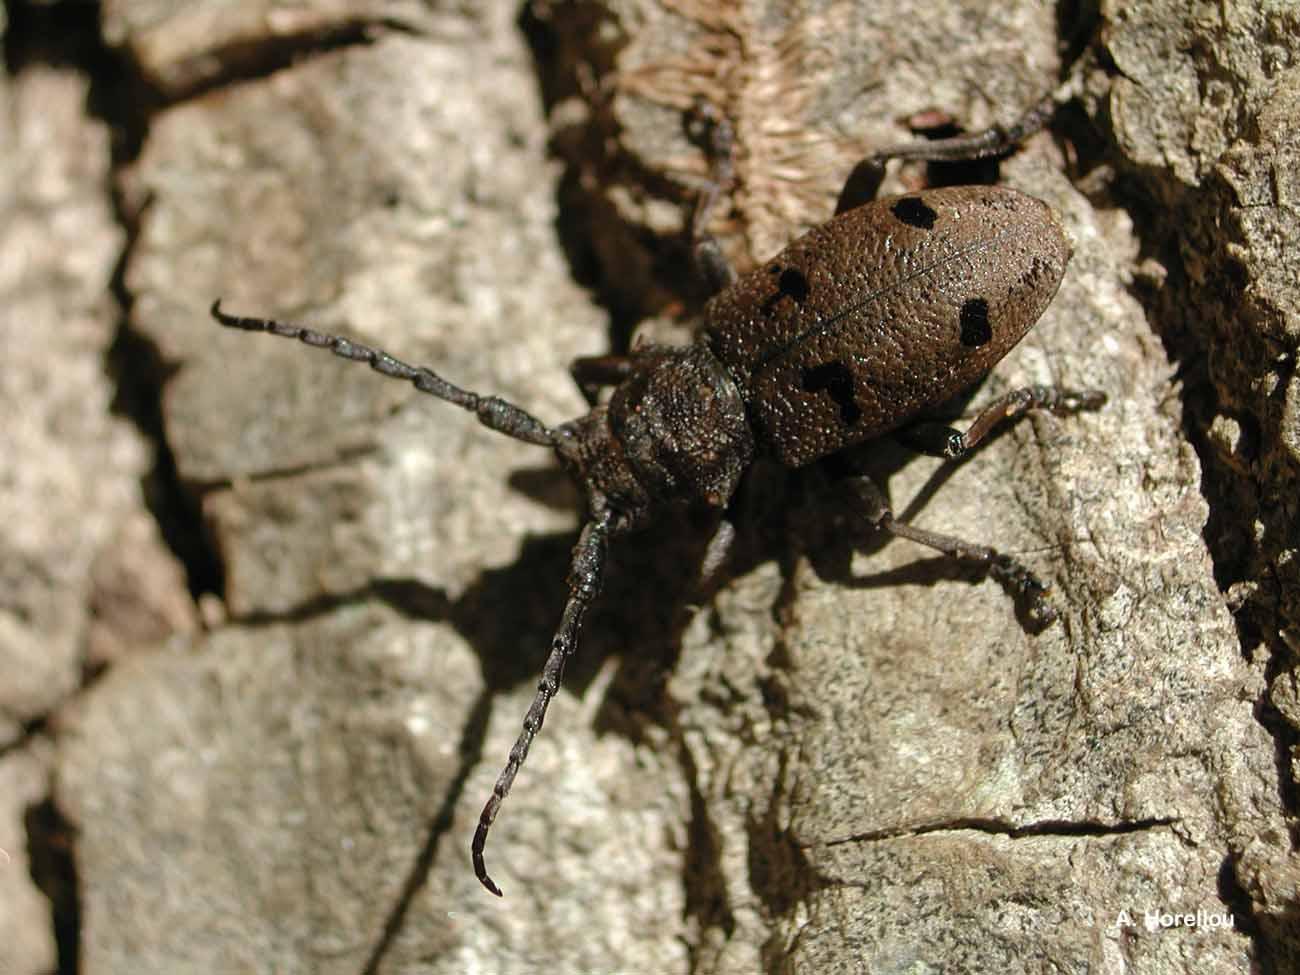 Herophila tristis